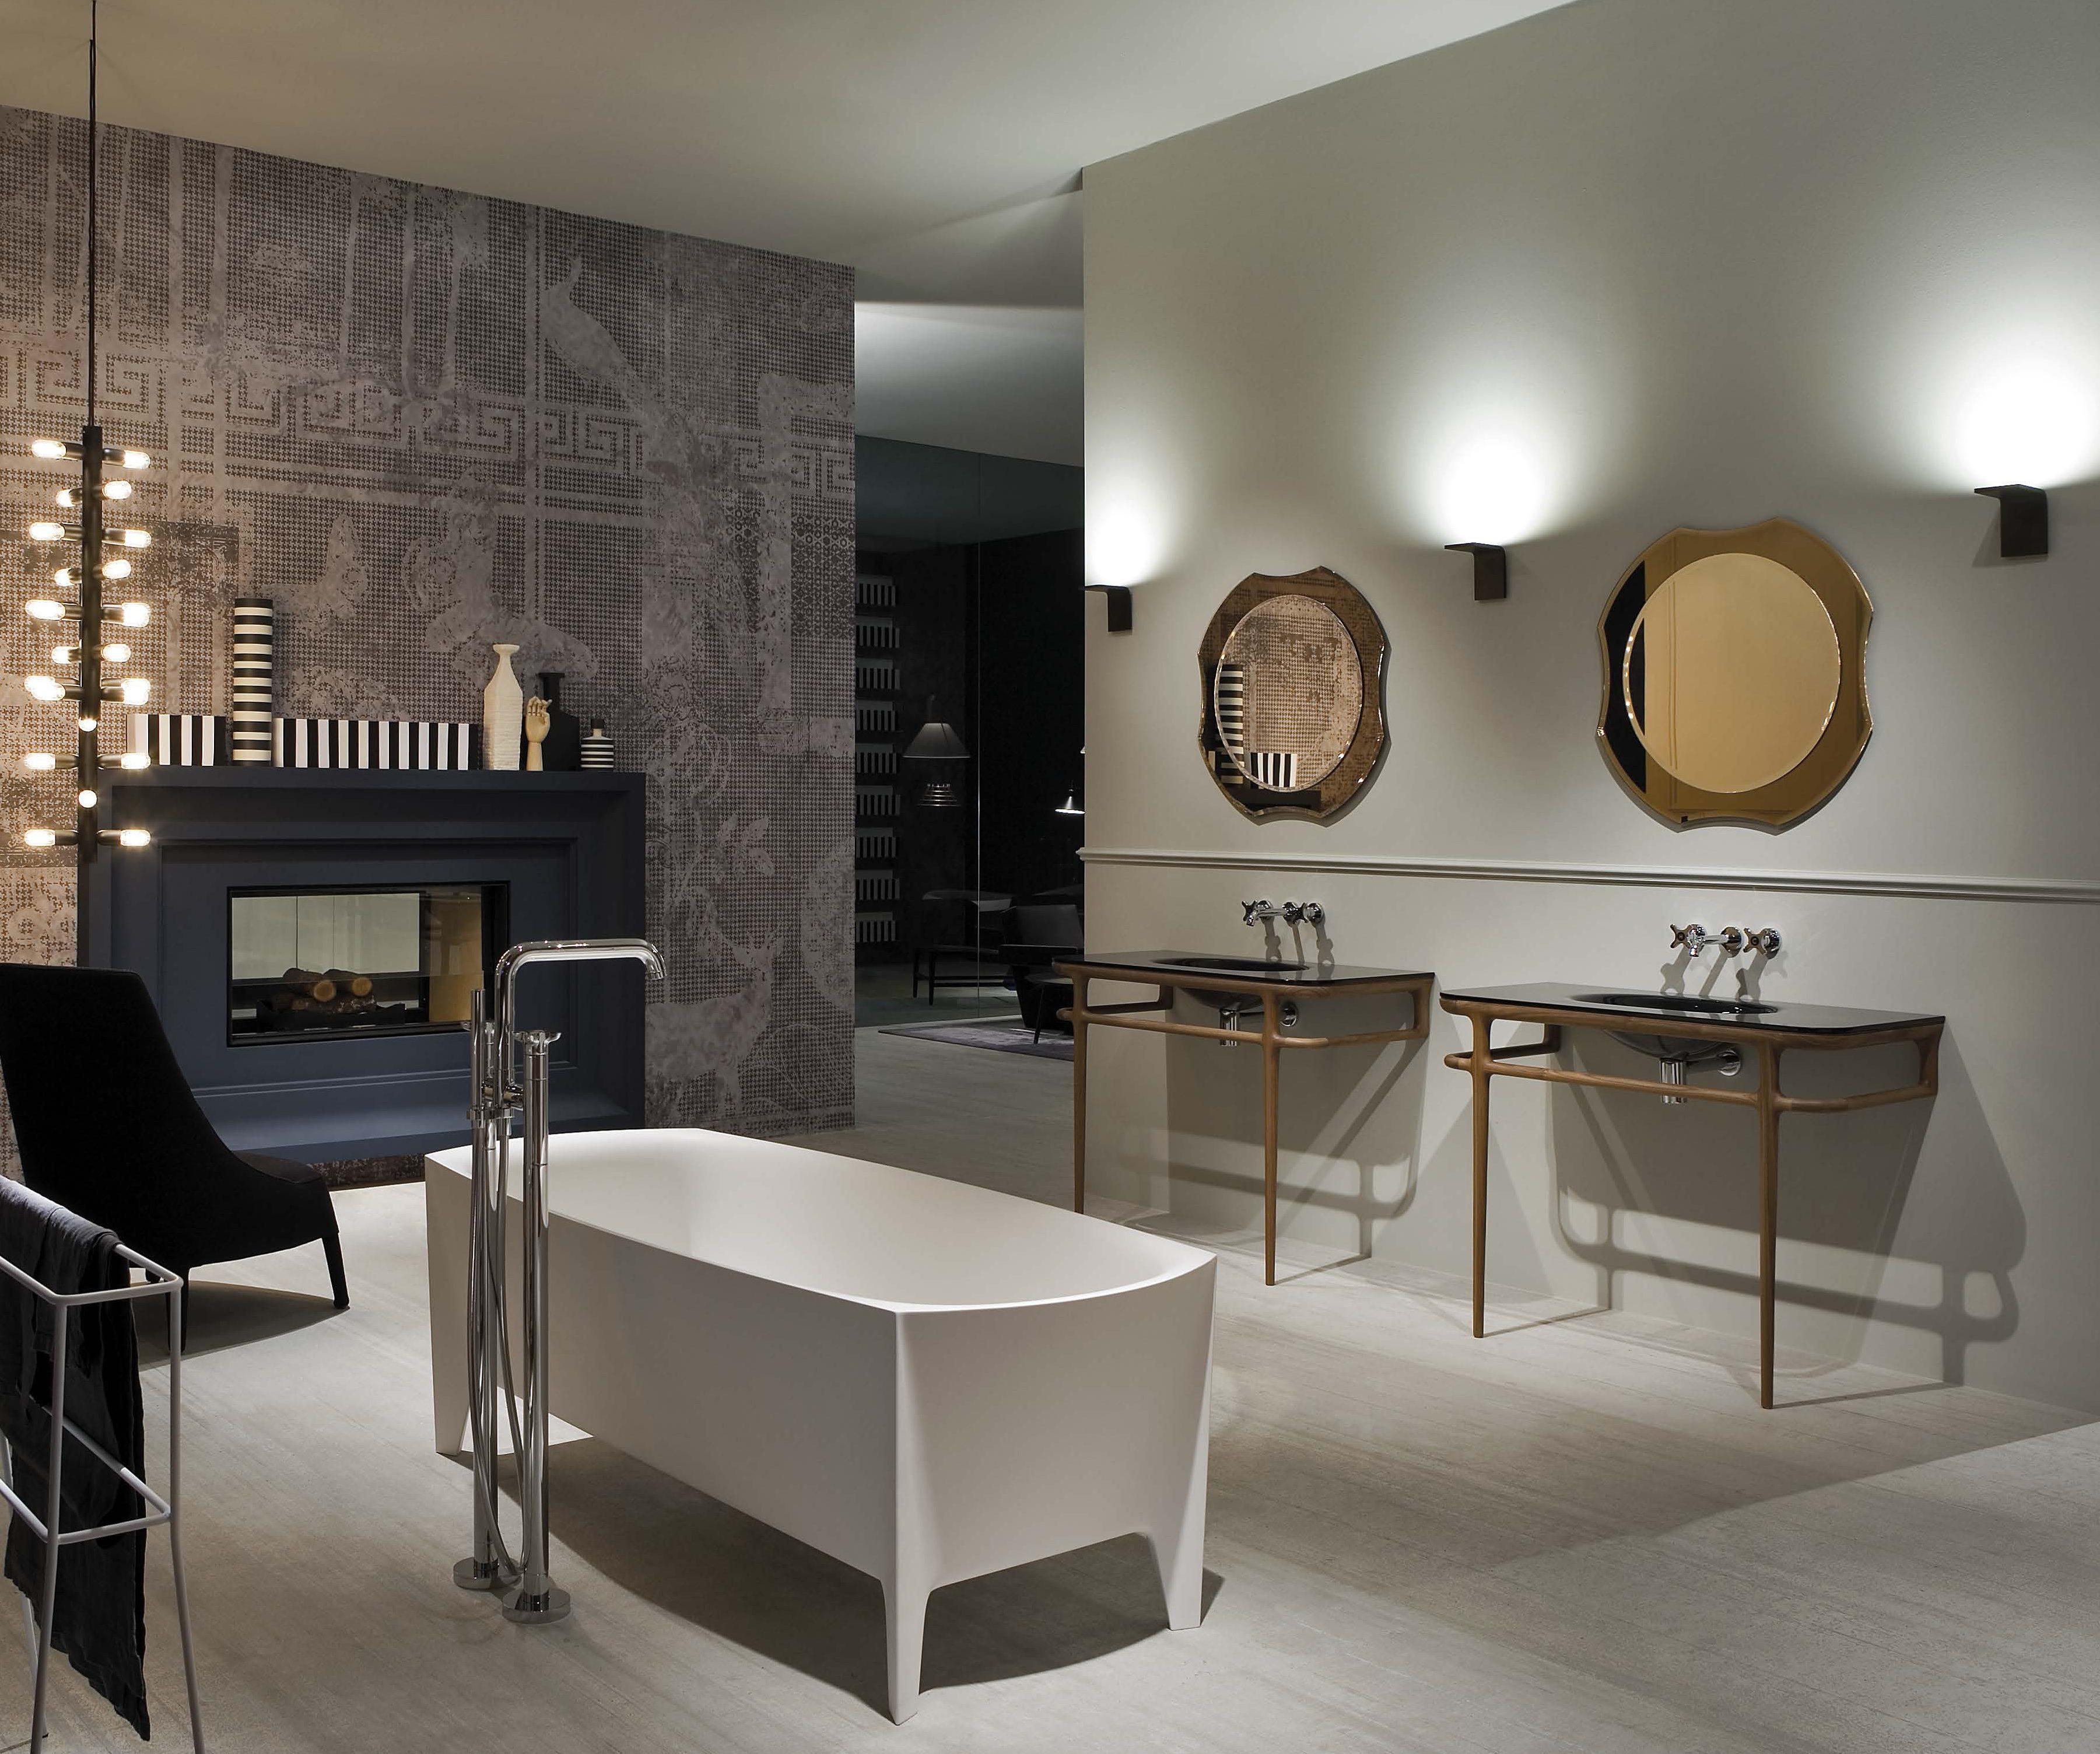 Fabricantes de muebles de cocina modernos for Muebles fabricantes